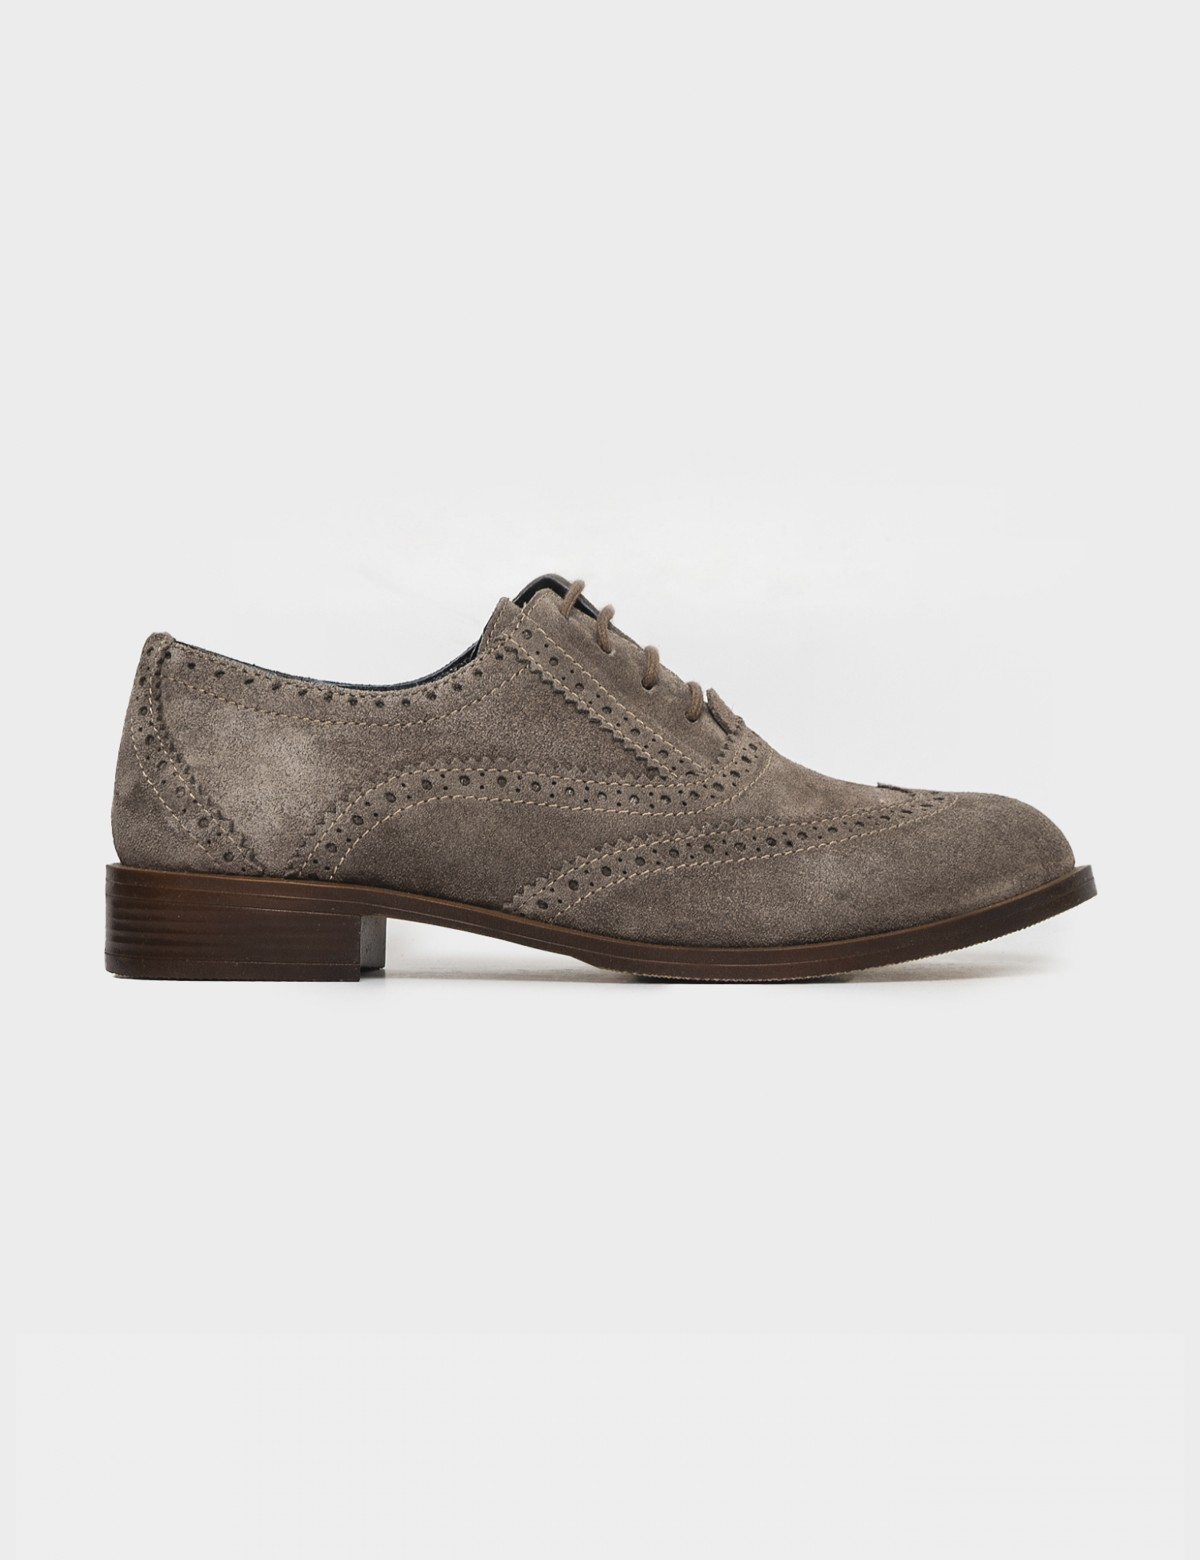 Туфли бежевые. Натуральная замша